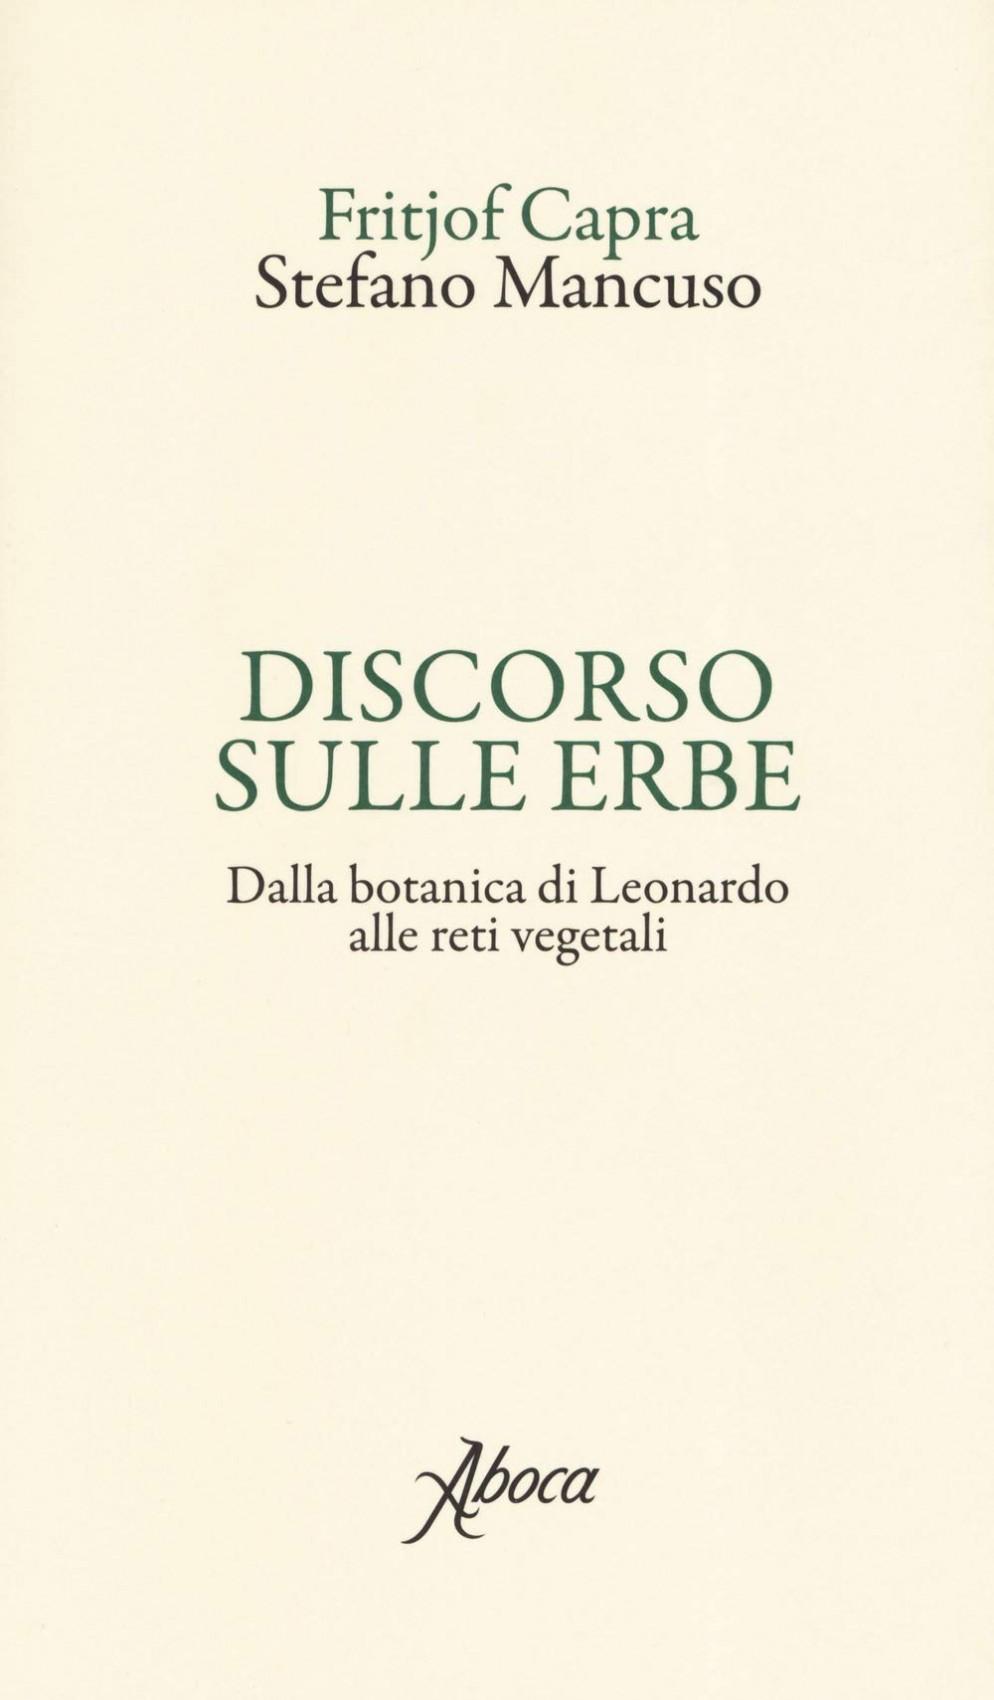 stefano-mancuso-libro-Discorso sulle erbe